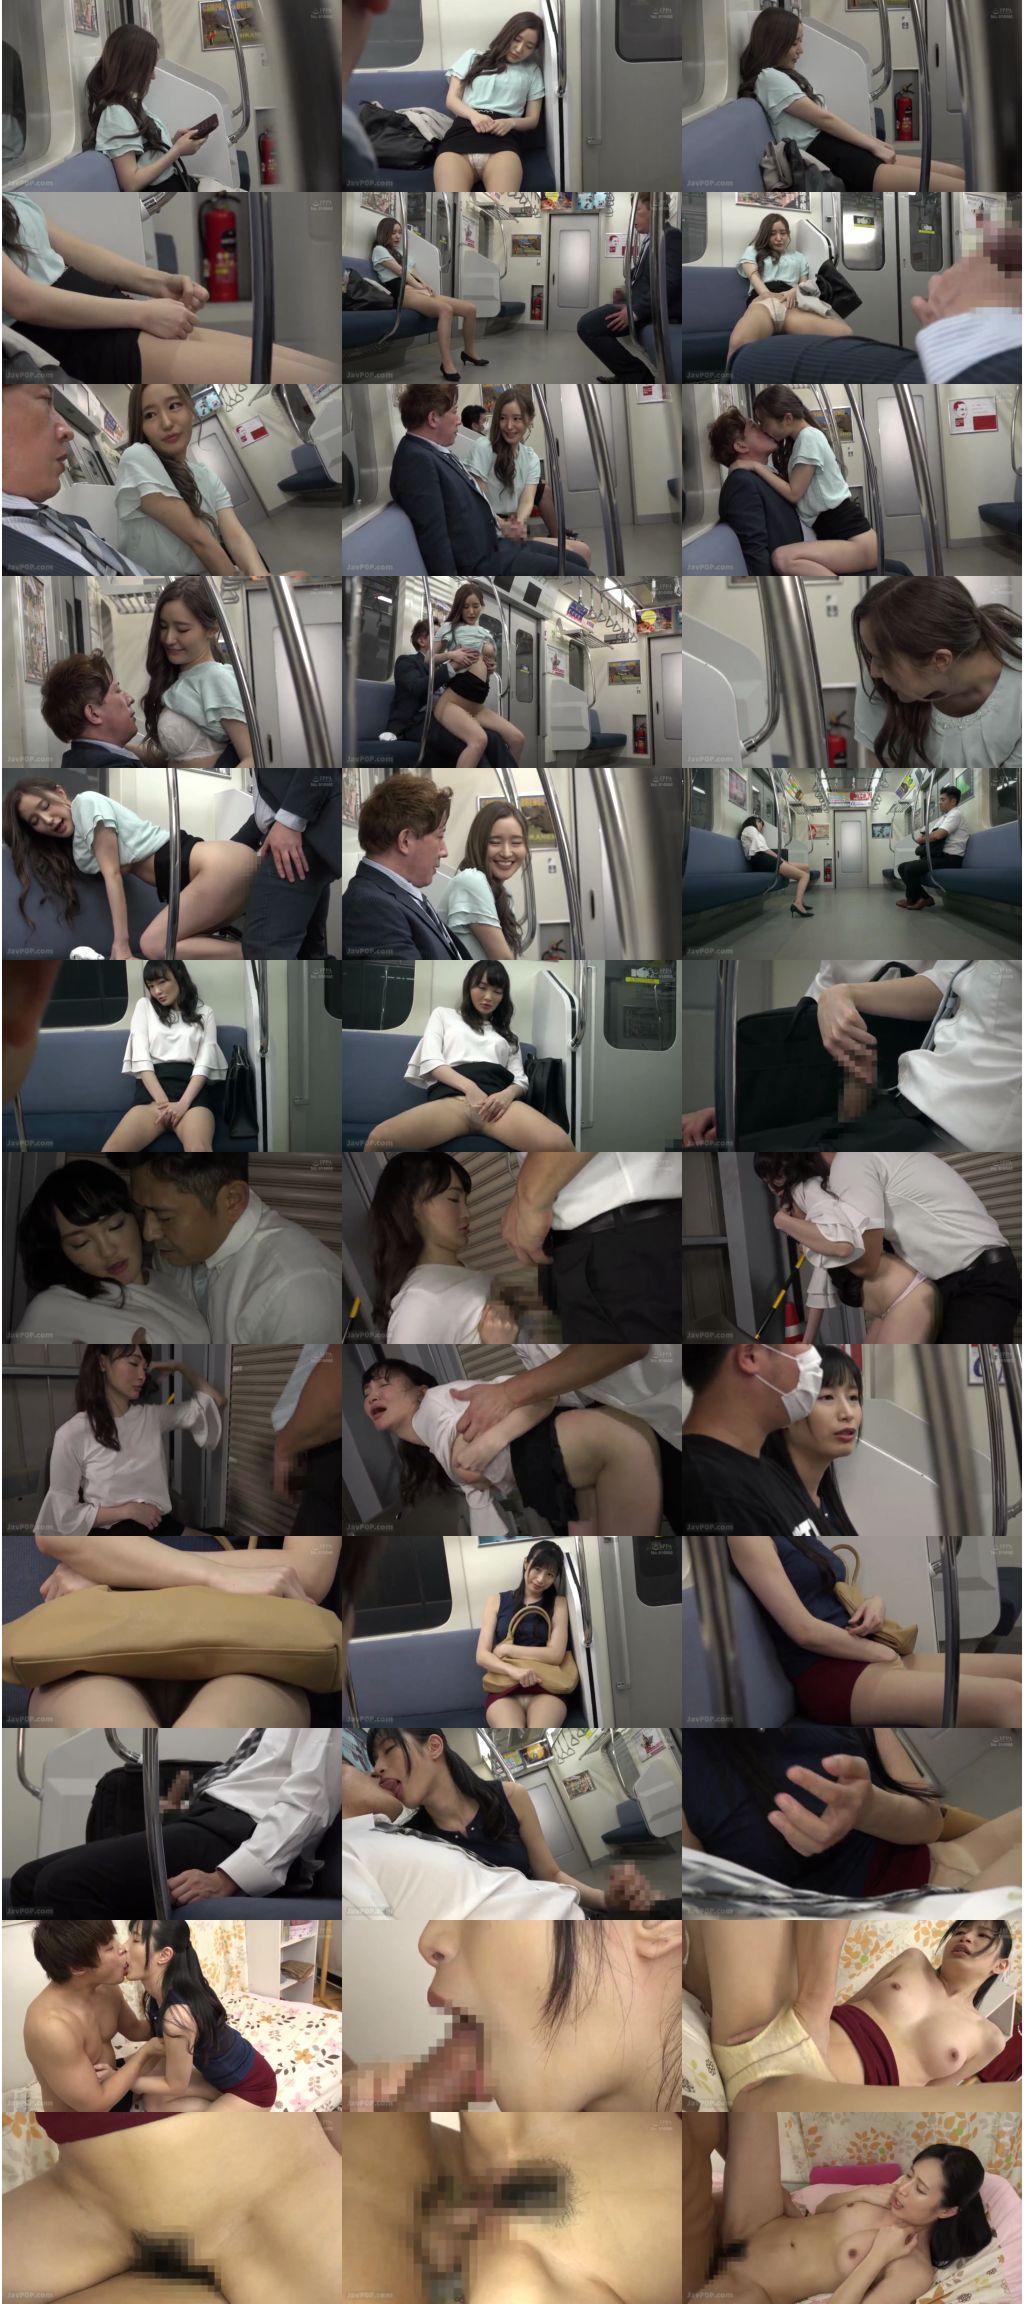 dandy 732 s - [DANDY-732] 最終電車で痴女とまさかの2人きり!向かいの座席でパンチラしてくるホロ酔い美脚女の誘惑で勃起したらヤられた パンスト Older Sister Breasts お姉さん Dandy